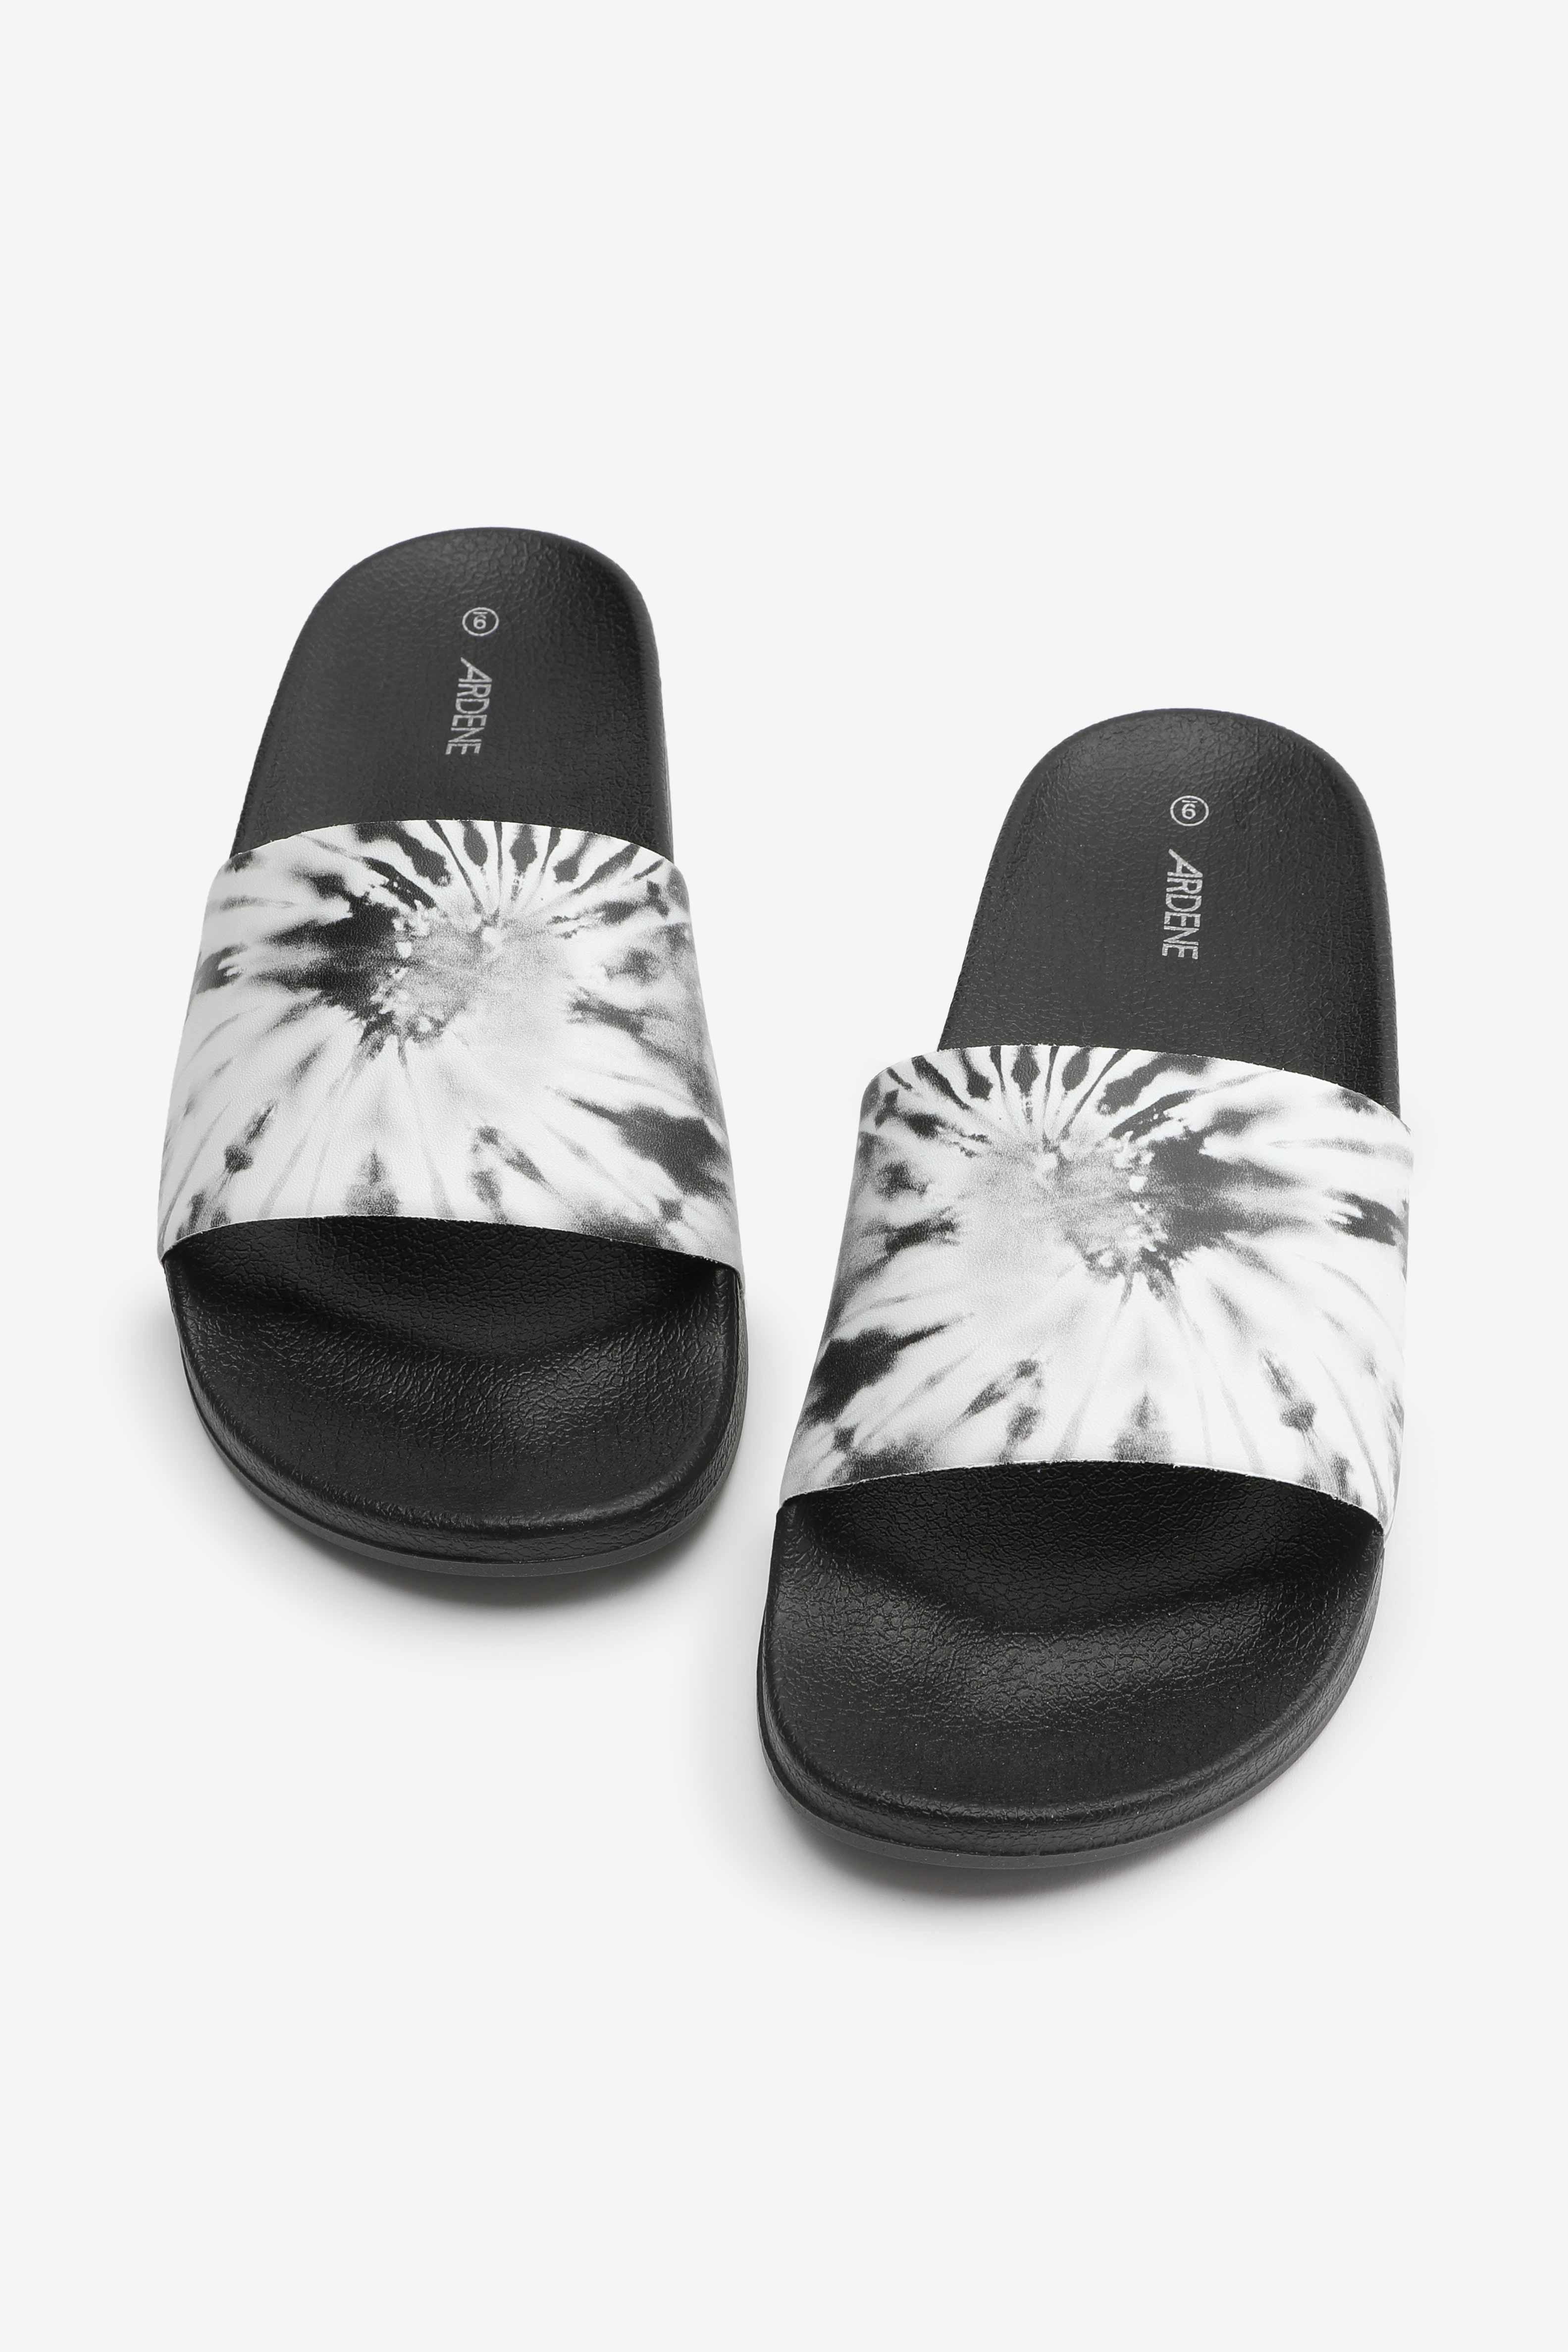 Tie-Dye Slide Sandals